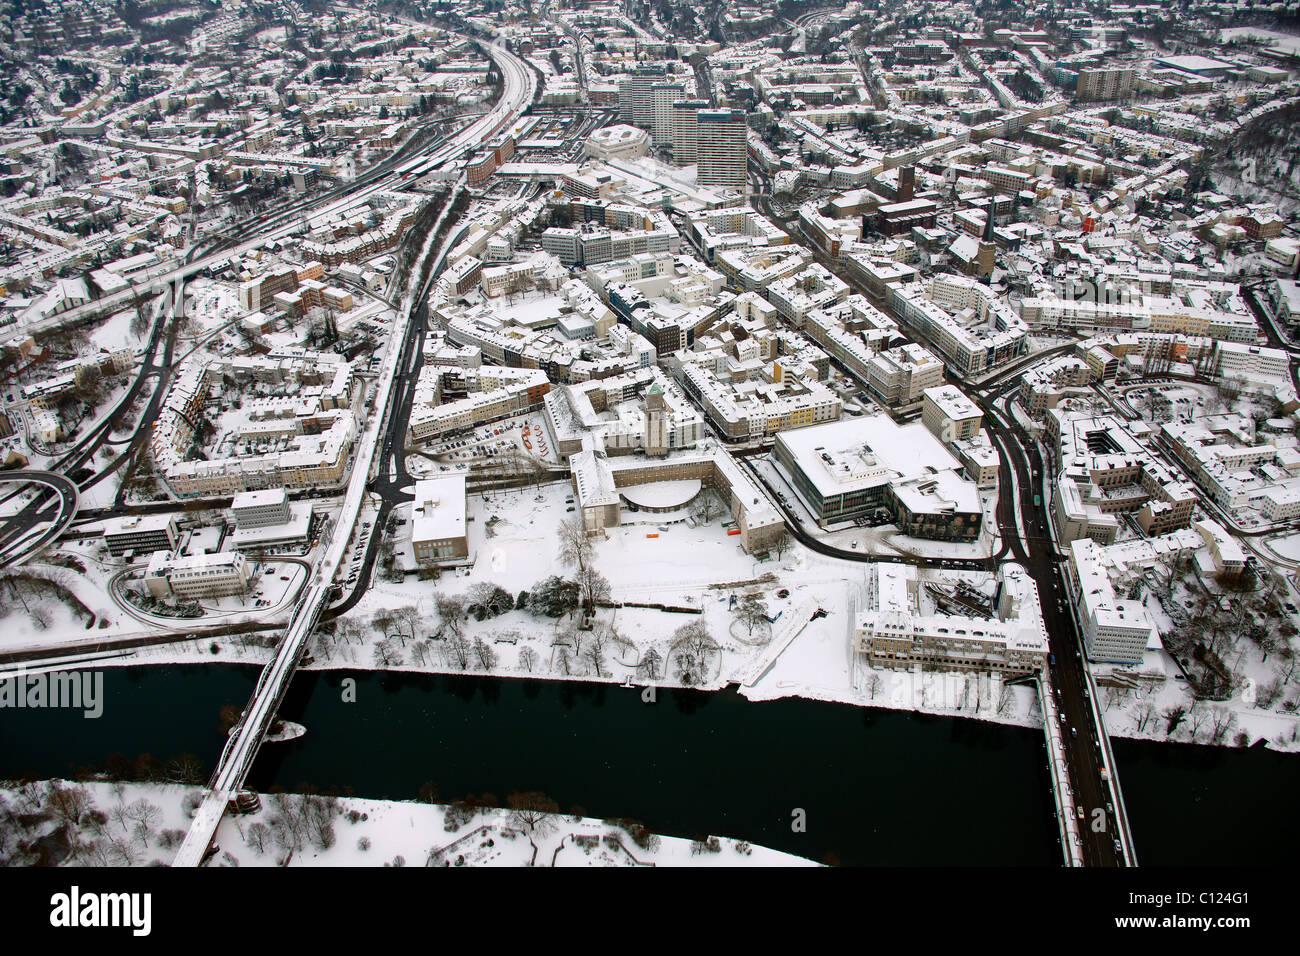 Aerial view, Urbania, Urbana, Muelheim an der Ruhr, Ruhrgebiet region, North Rhine-Westphalia, Germany, Europe - Stock Image